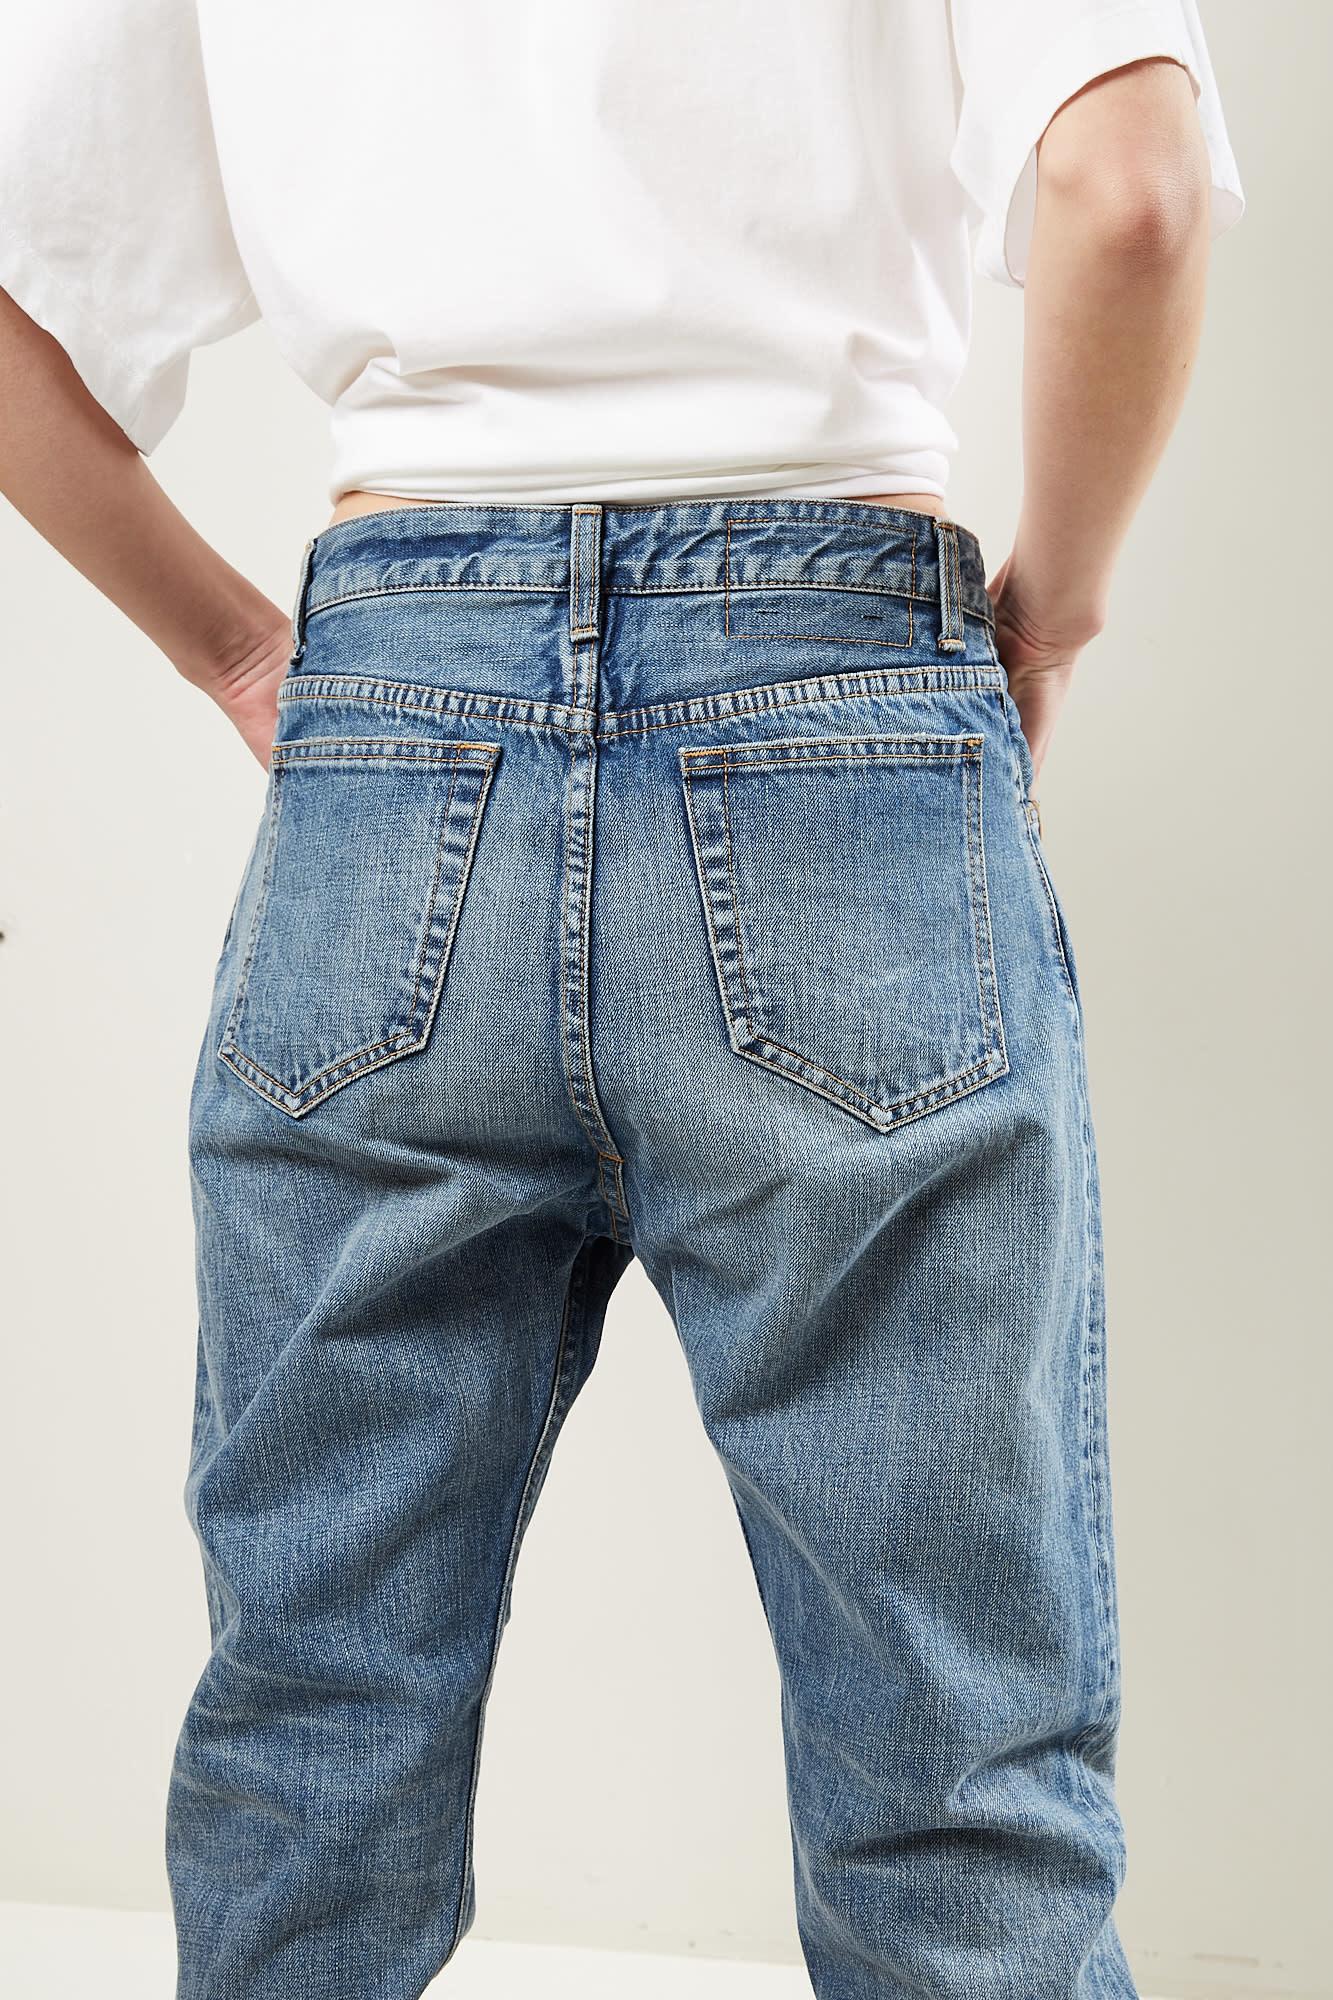 C. Cruden C.C.01 5 pocket jeans